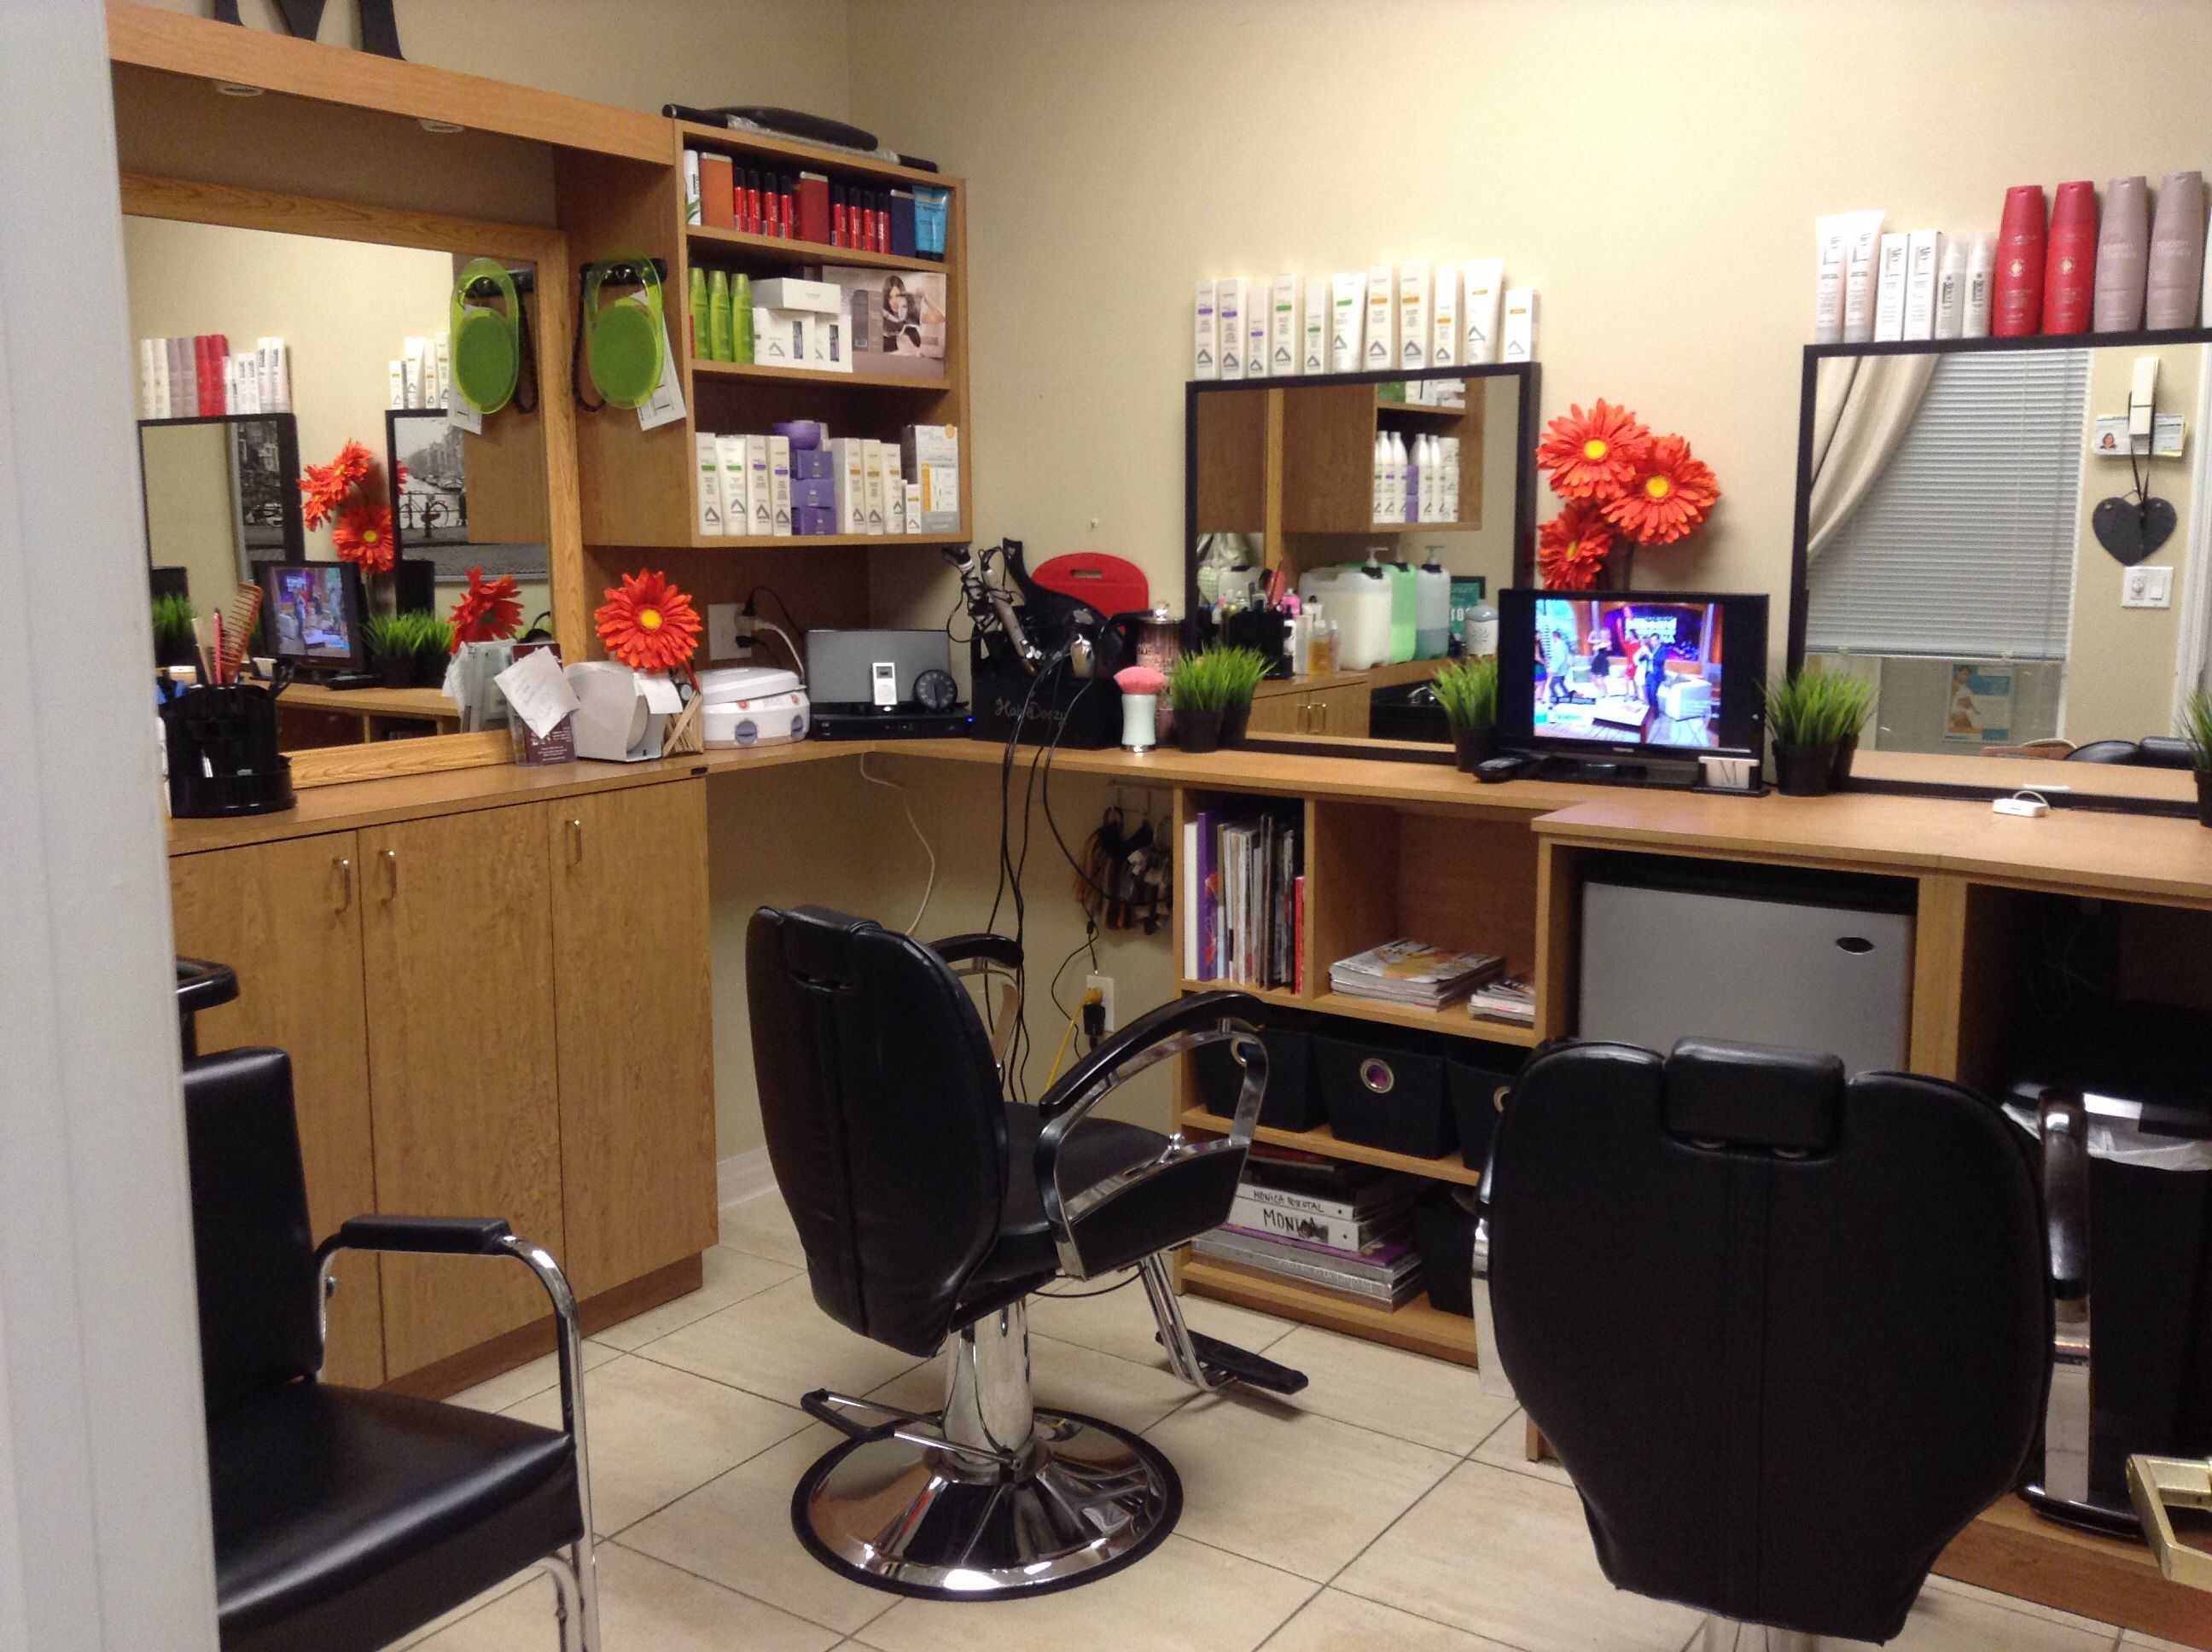 Hair Salon Pic Home Home Decor Decor